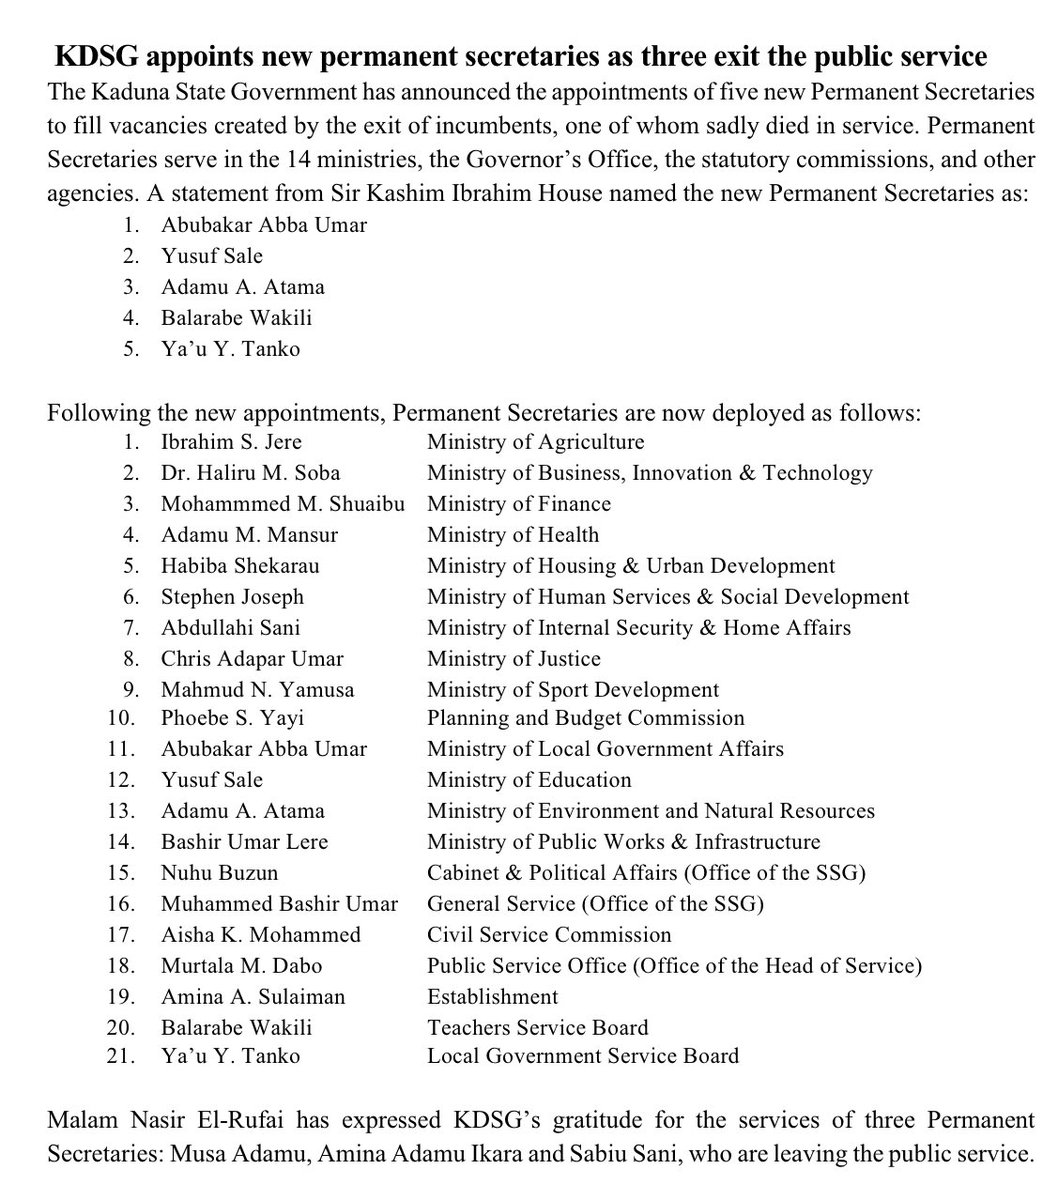 KDSG has appointed five new Permanent Secretaries and announced new deployments for these senior officials: 1.Abubakar Abba Umar 2.Yusuf Sale 3.Adamu A. Atama 4.Balarabe Wakili 5.Ya'u Y. Tanko